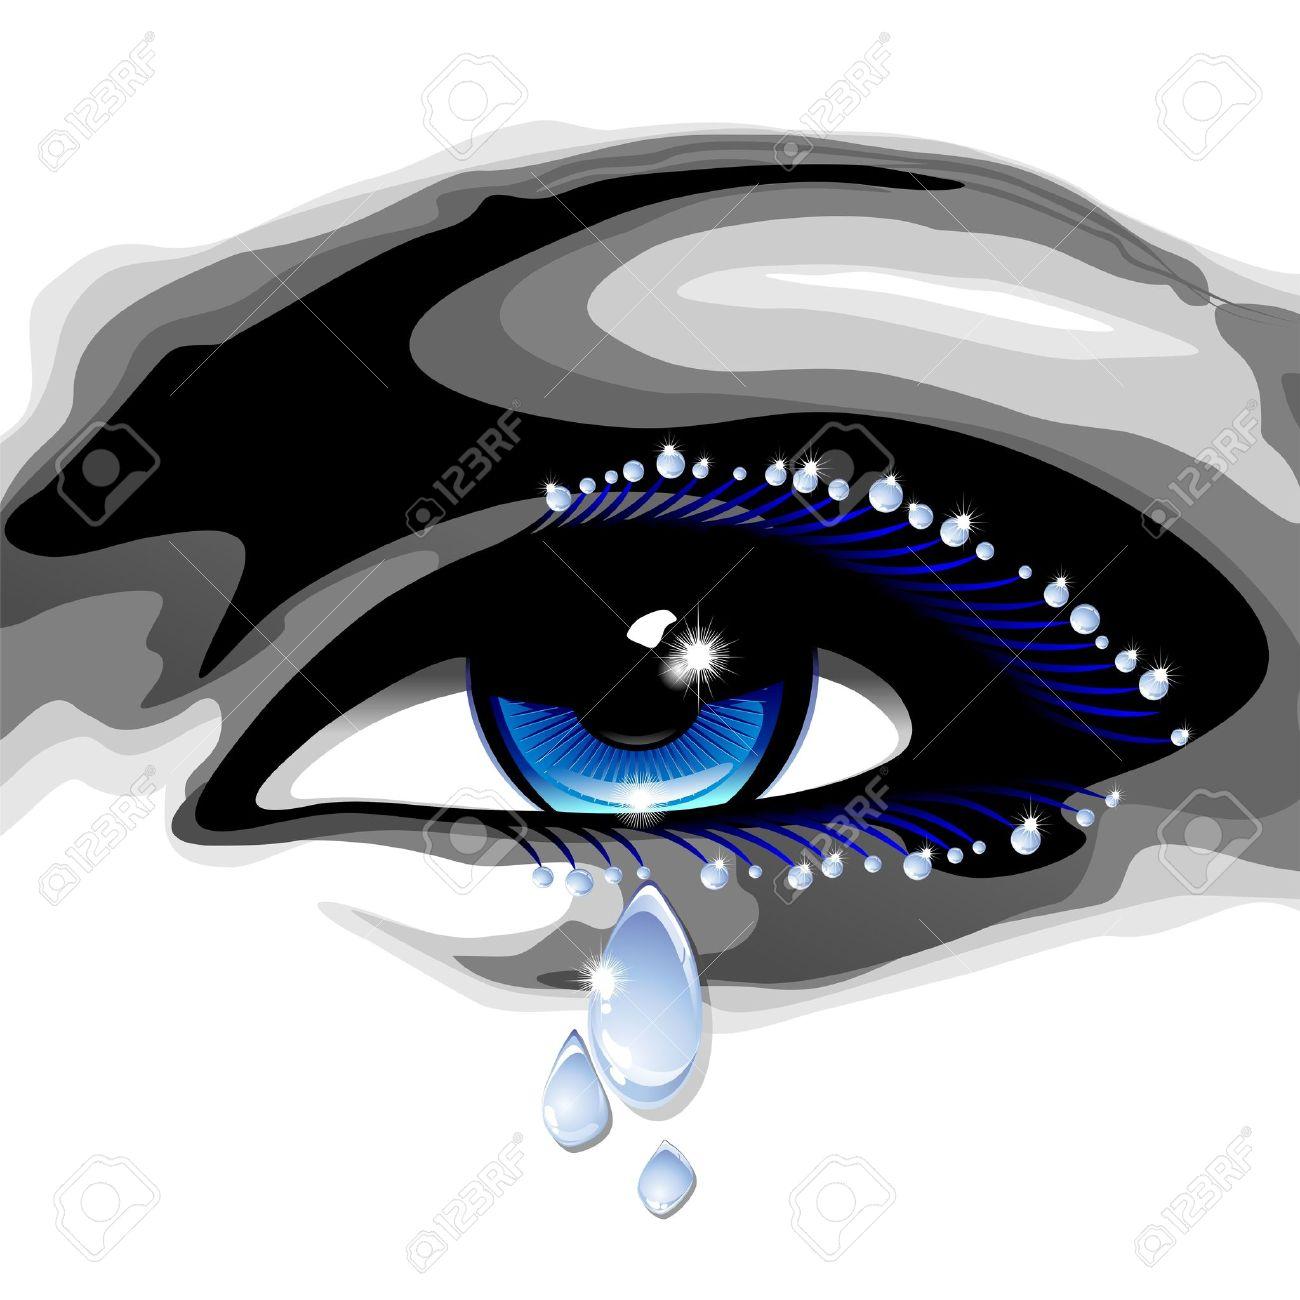 Beautiful Blue Eye with Tears Stock Vector - 16478726